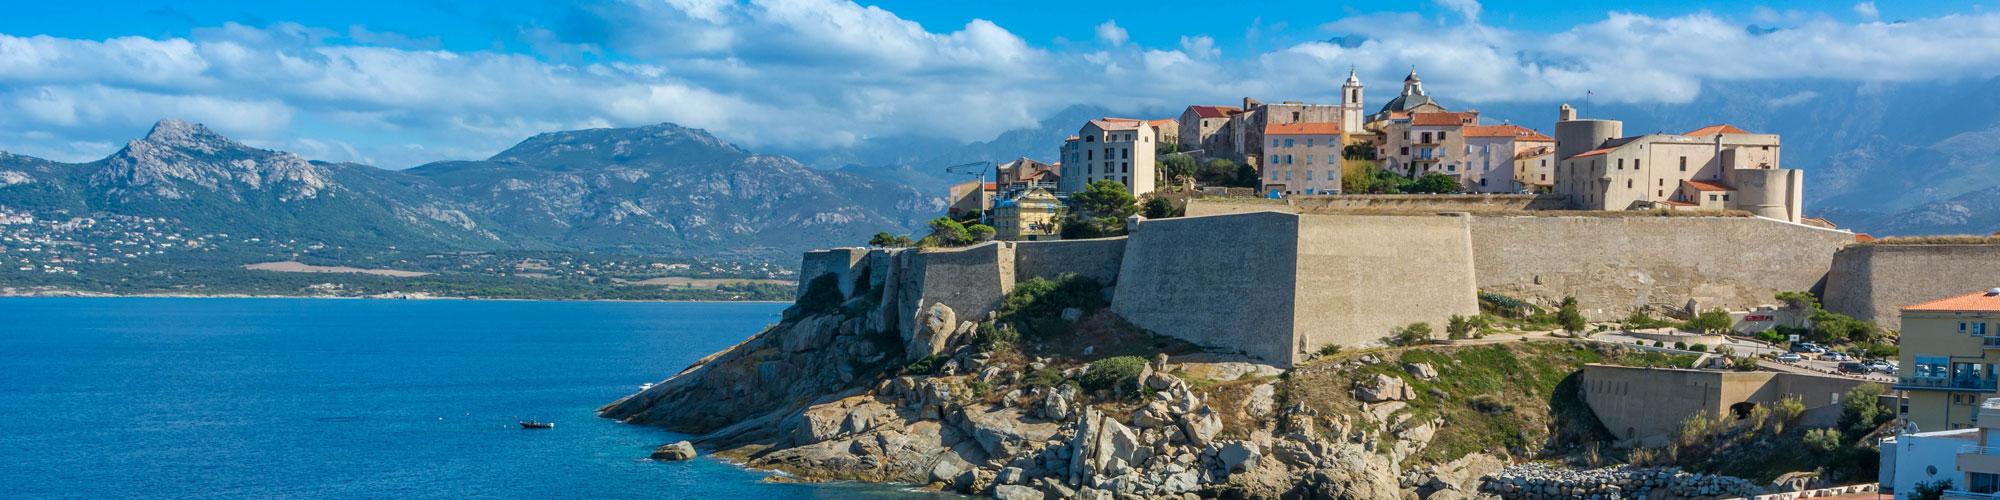 Paradisu - Korsika - Corse - Calvi